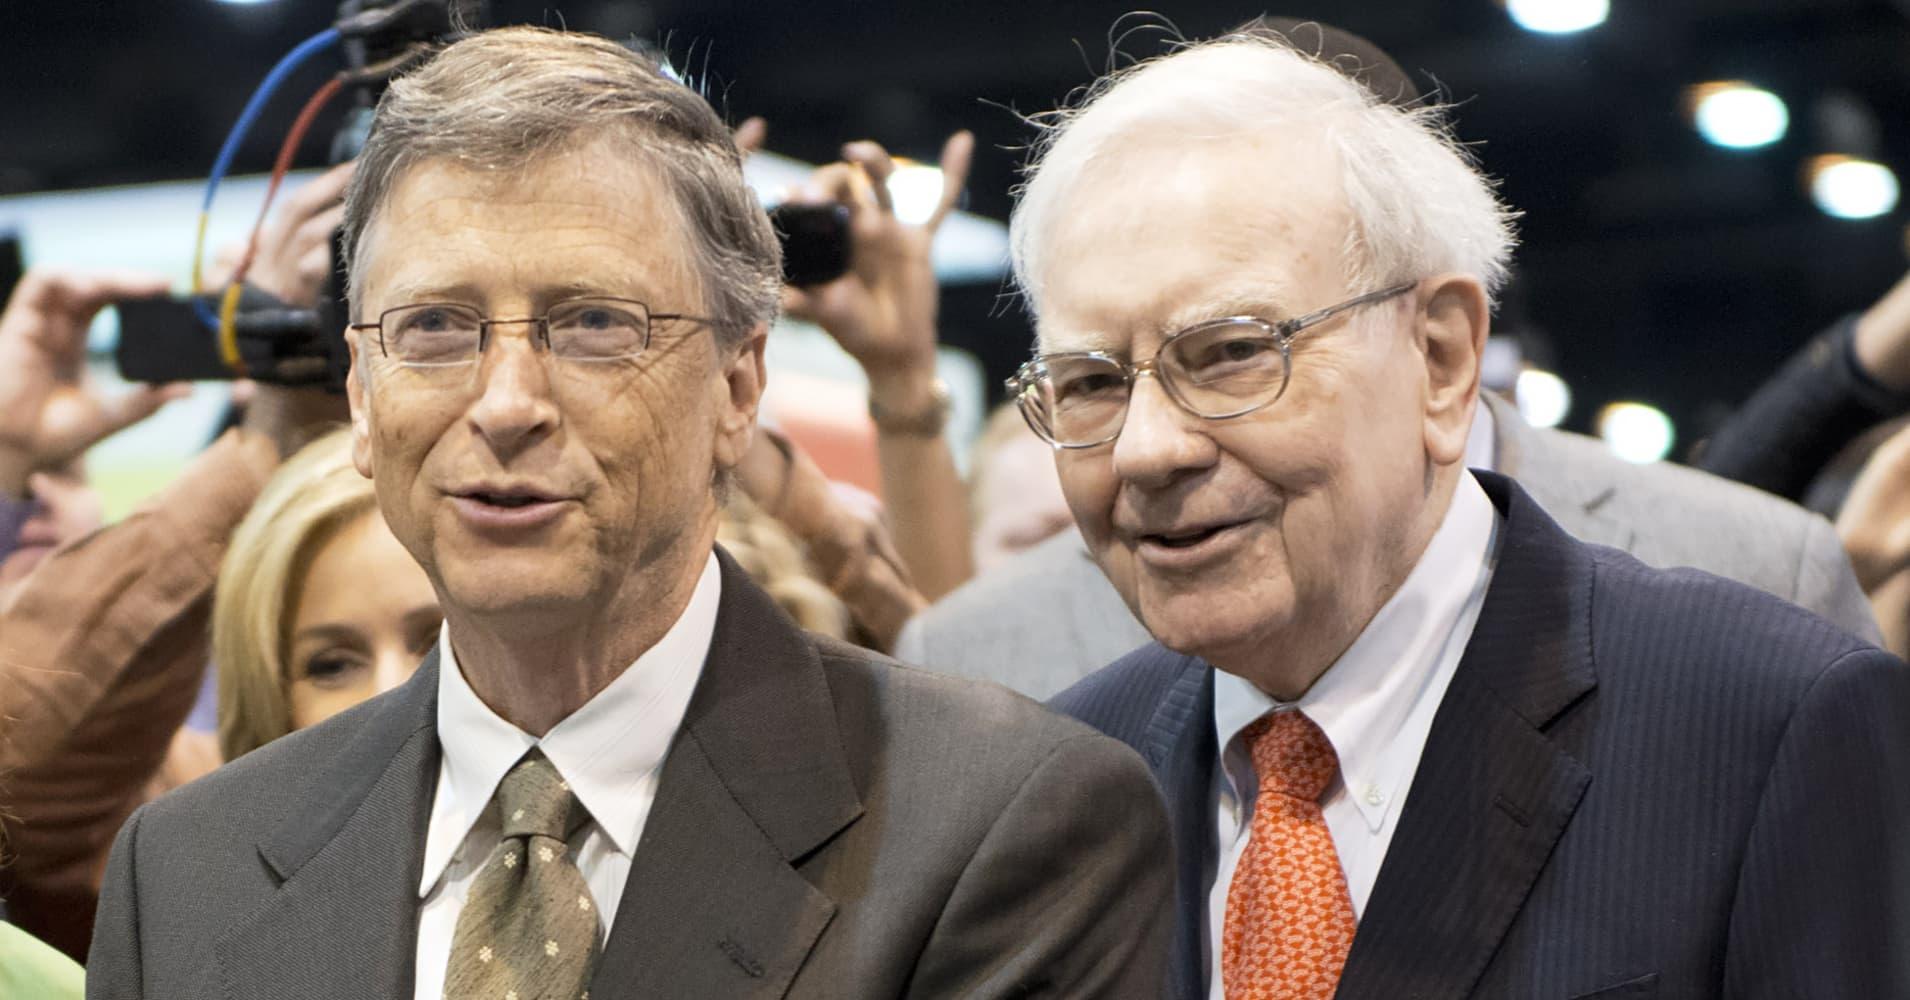 Bill Gates xay lo phan ung hat nhan anh 1